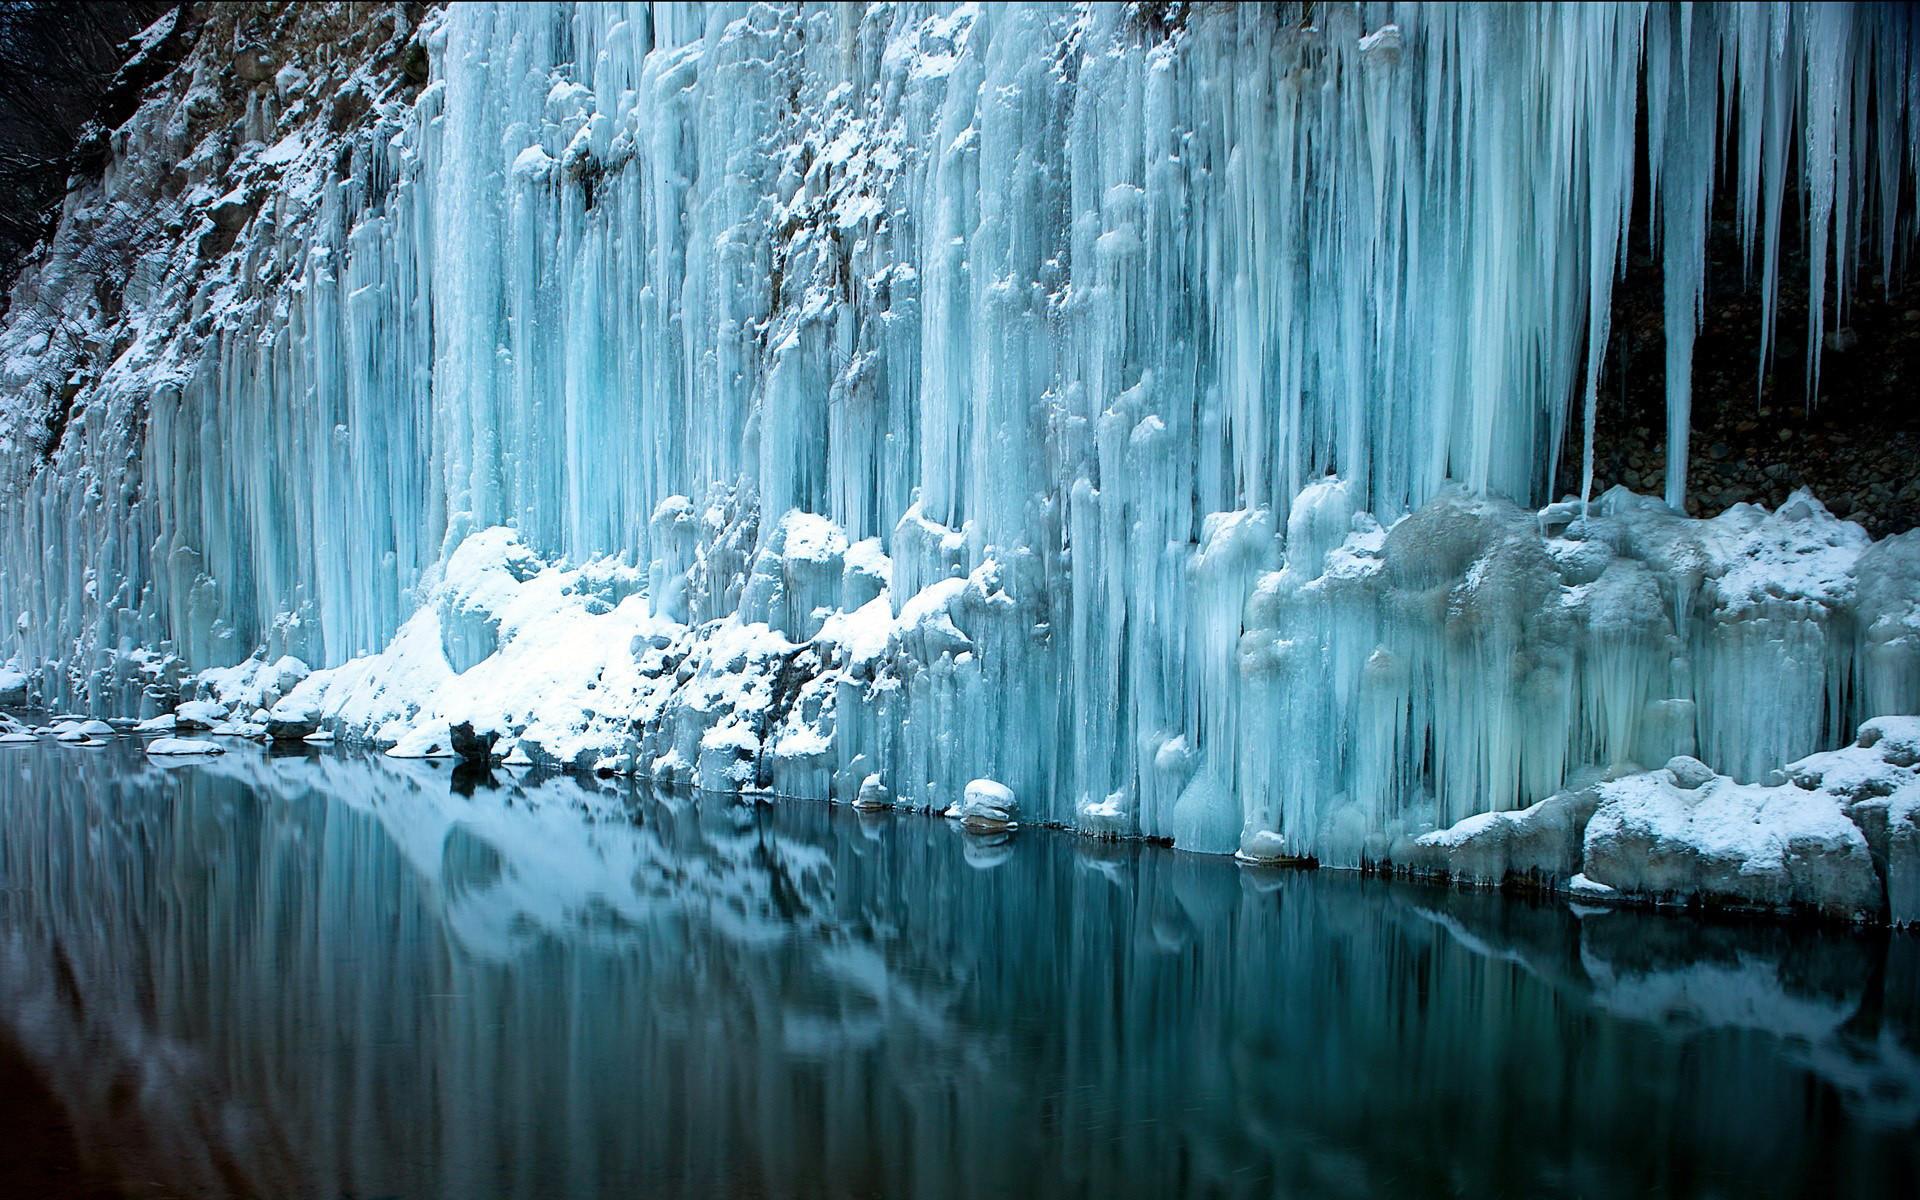 waterfall water reflection rivers freeze frozen snow winter wallpaper .